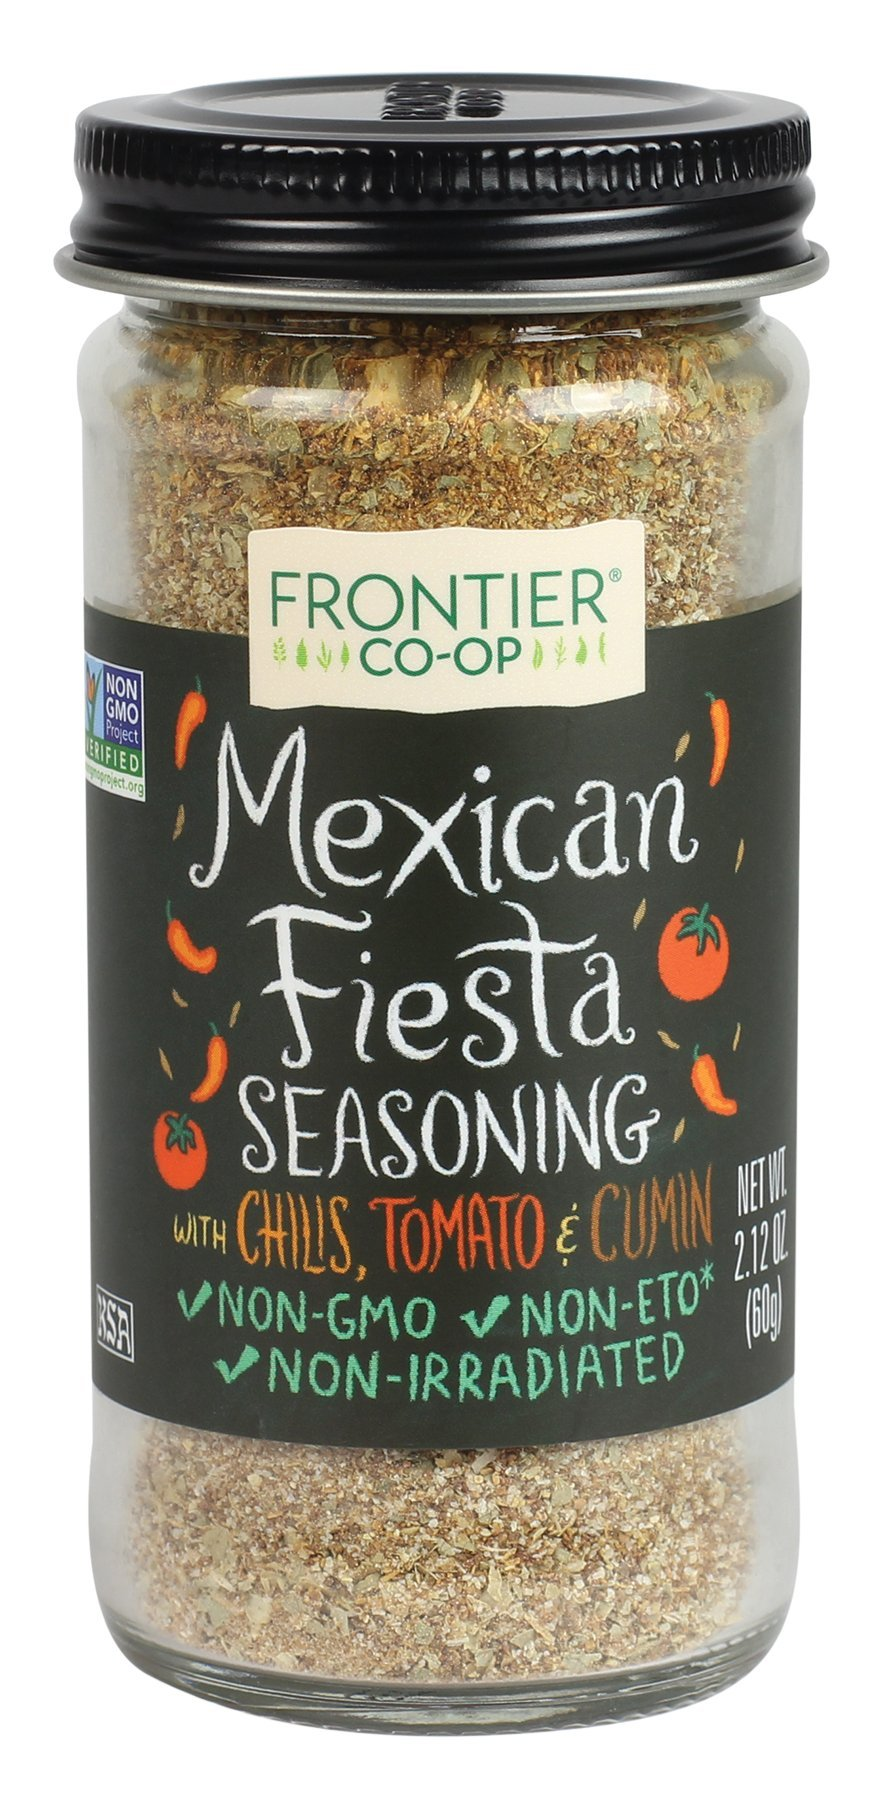 Frontier Seasoning Blends Mexican Fiesta, 2.12 Ounce Bottle (Pack of 12)